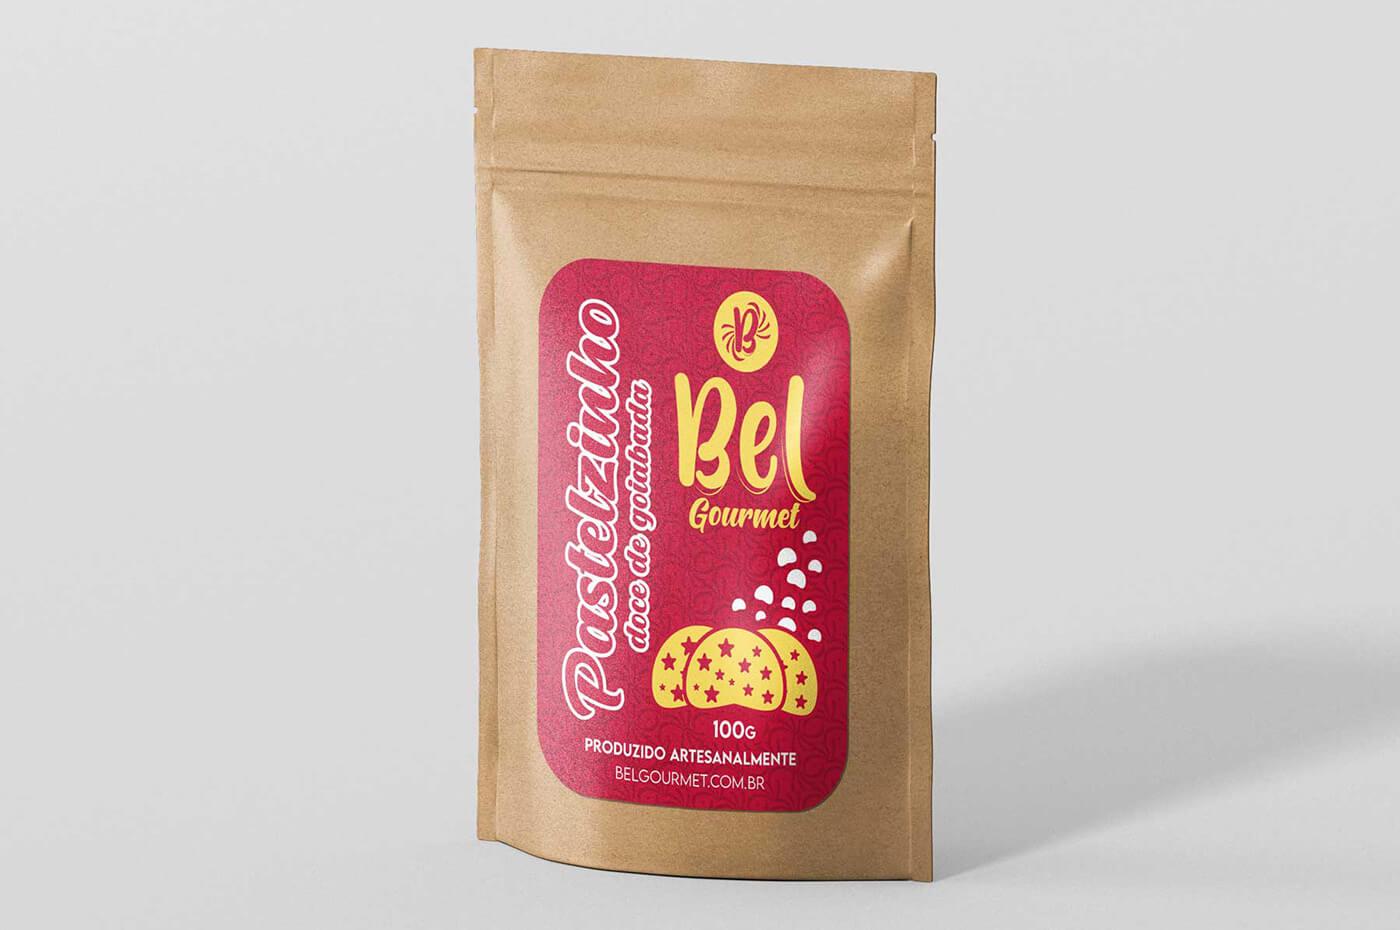 https://www.rafaeloliveira.com/portfolio/bel-gourmet